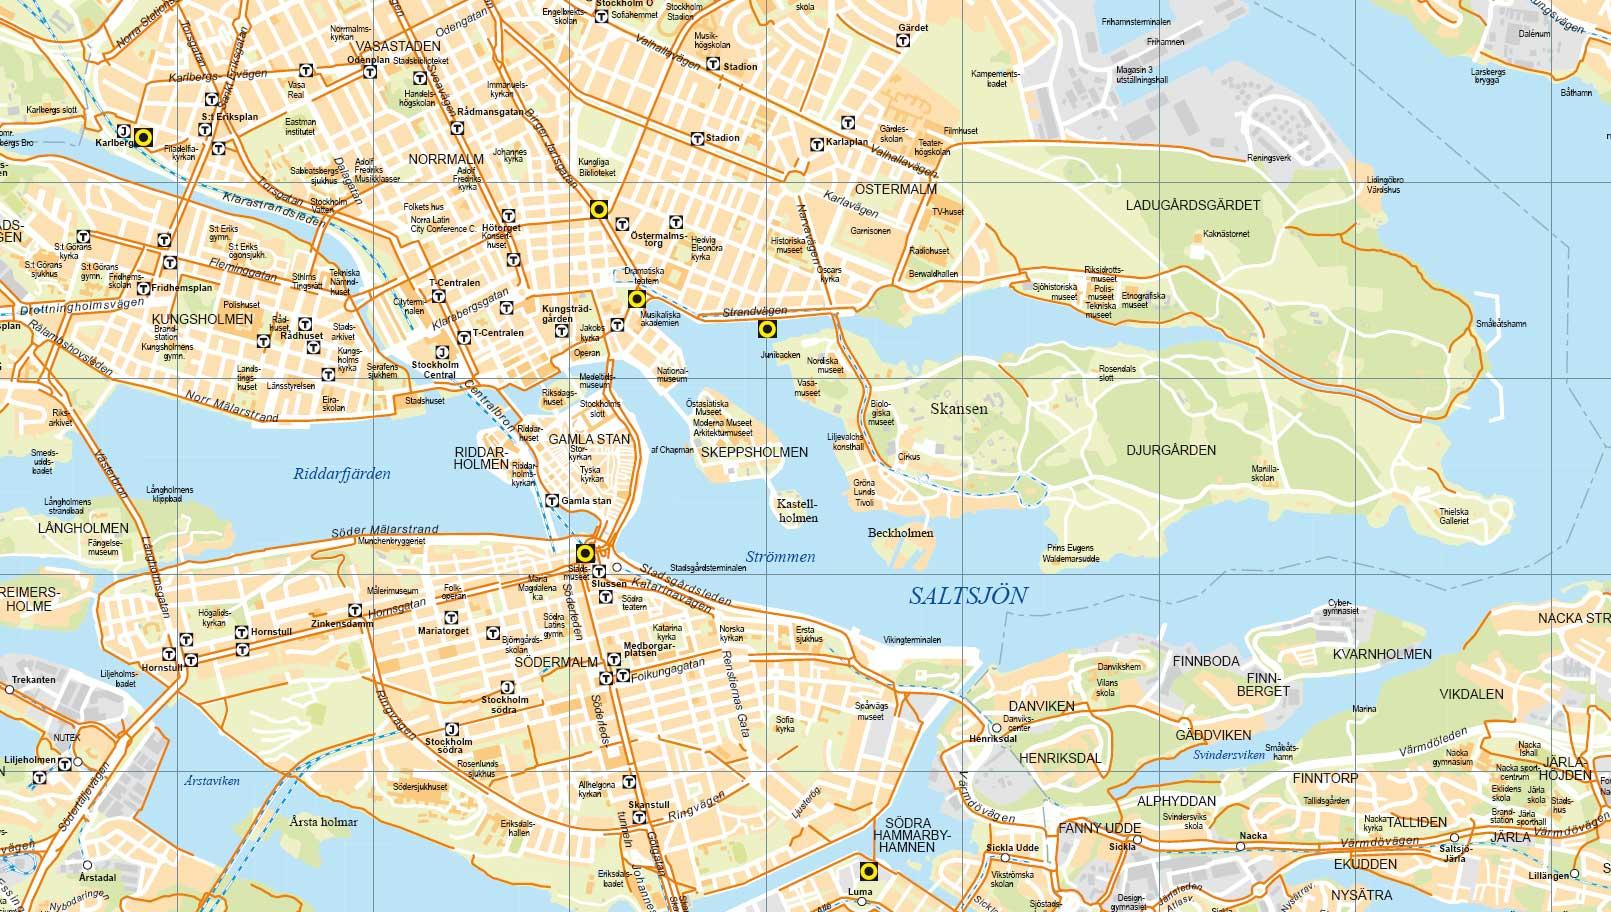 stockholm city karta sensuell massage i stockholm